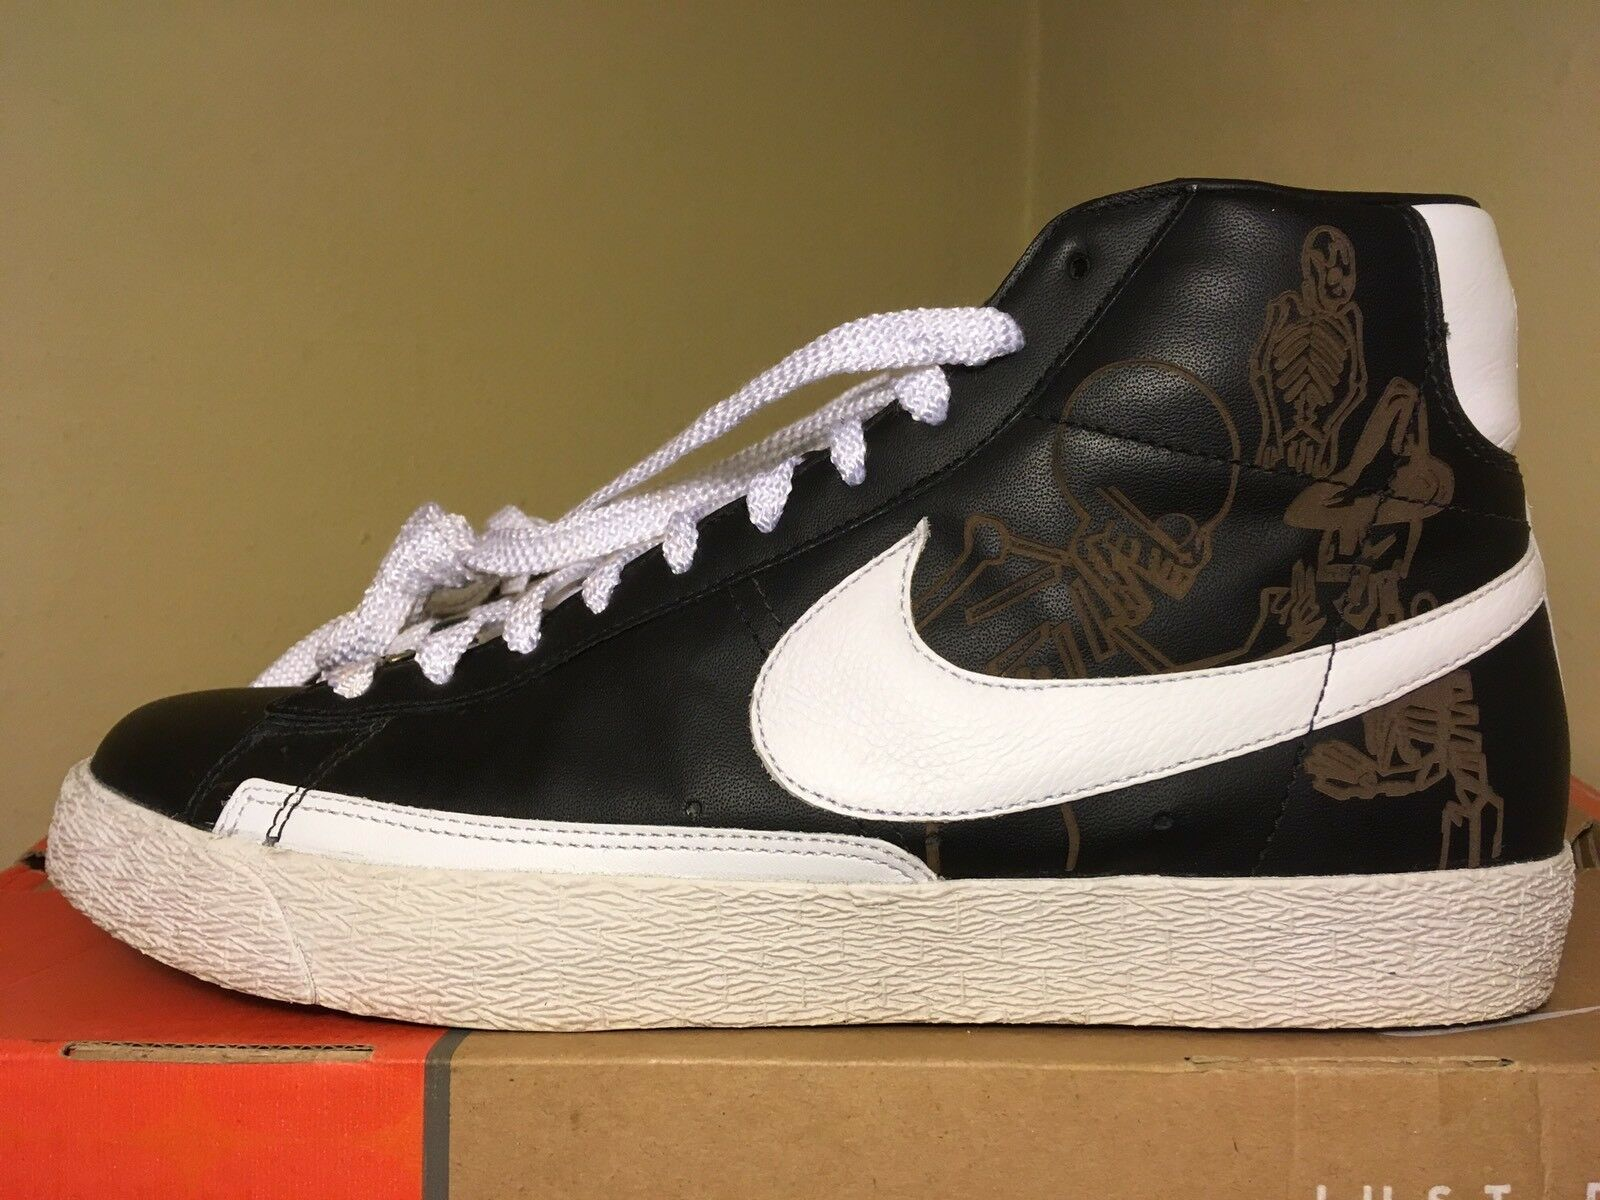 Nike Blazer High Premium Sz. 10.5 In Blk/Wht/Orng Blaze 100% Authentic!!